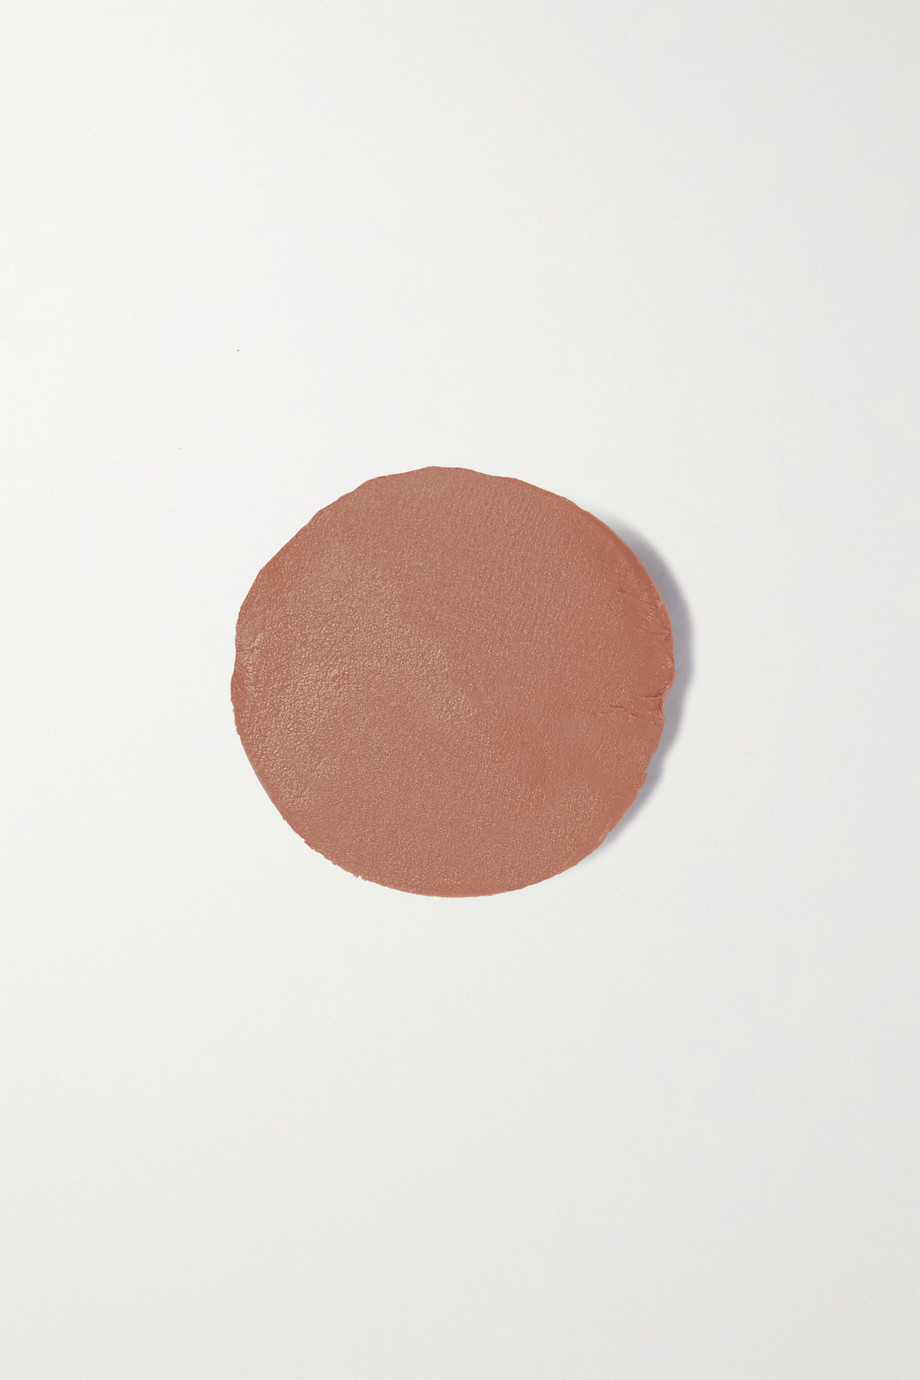 Victoria Beckham Beauty Posh Lipstick – Spice – Lippenstift